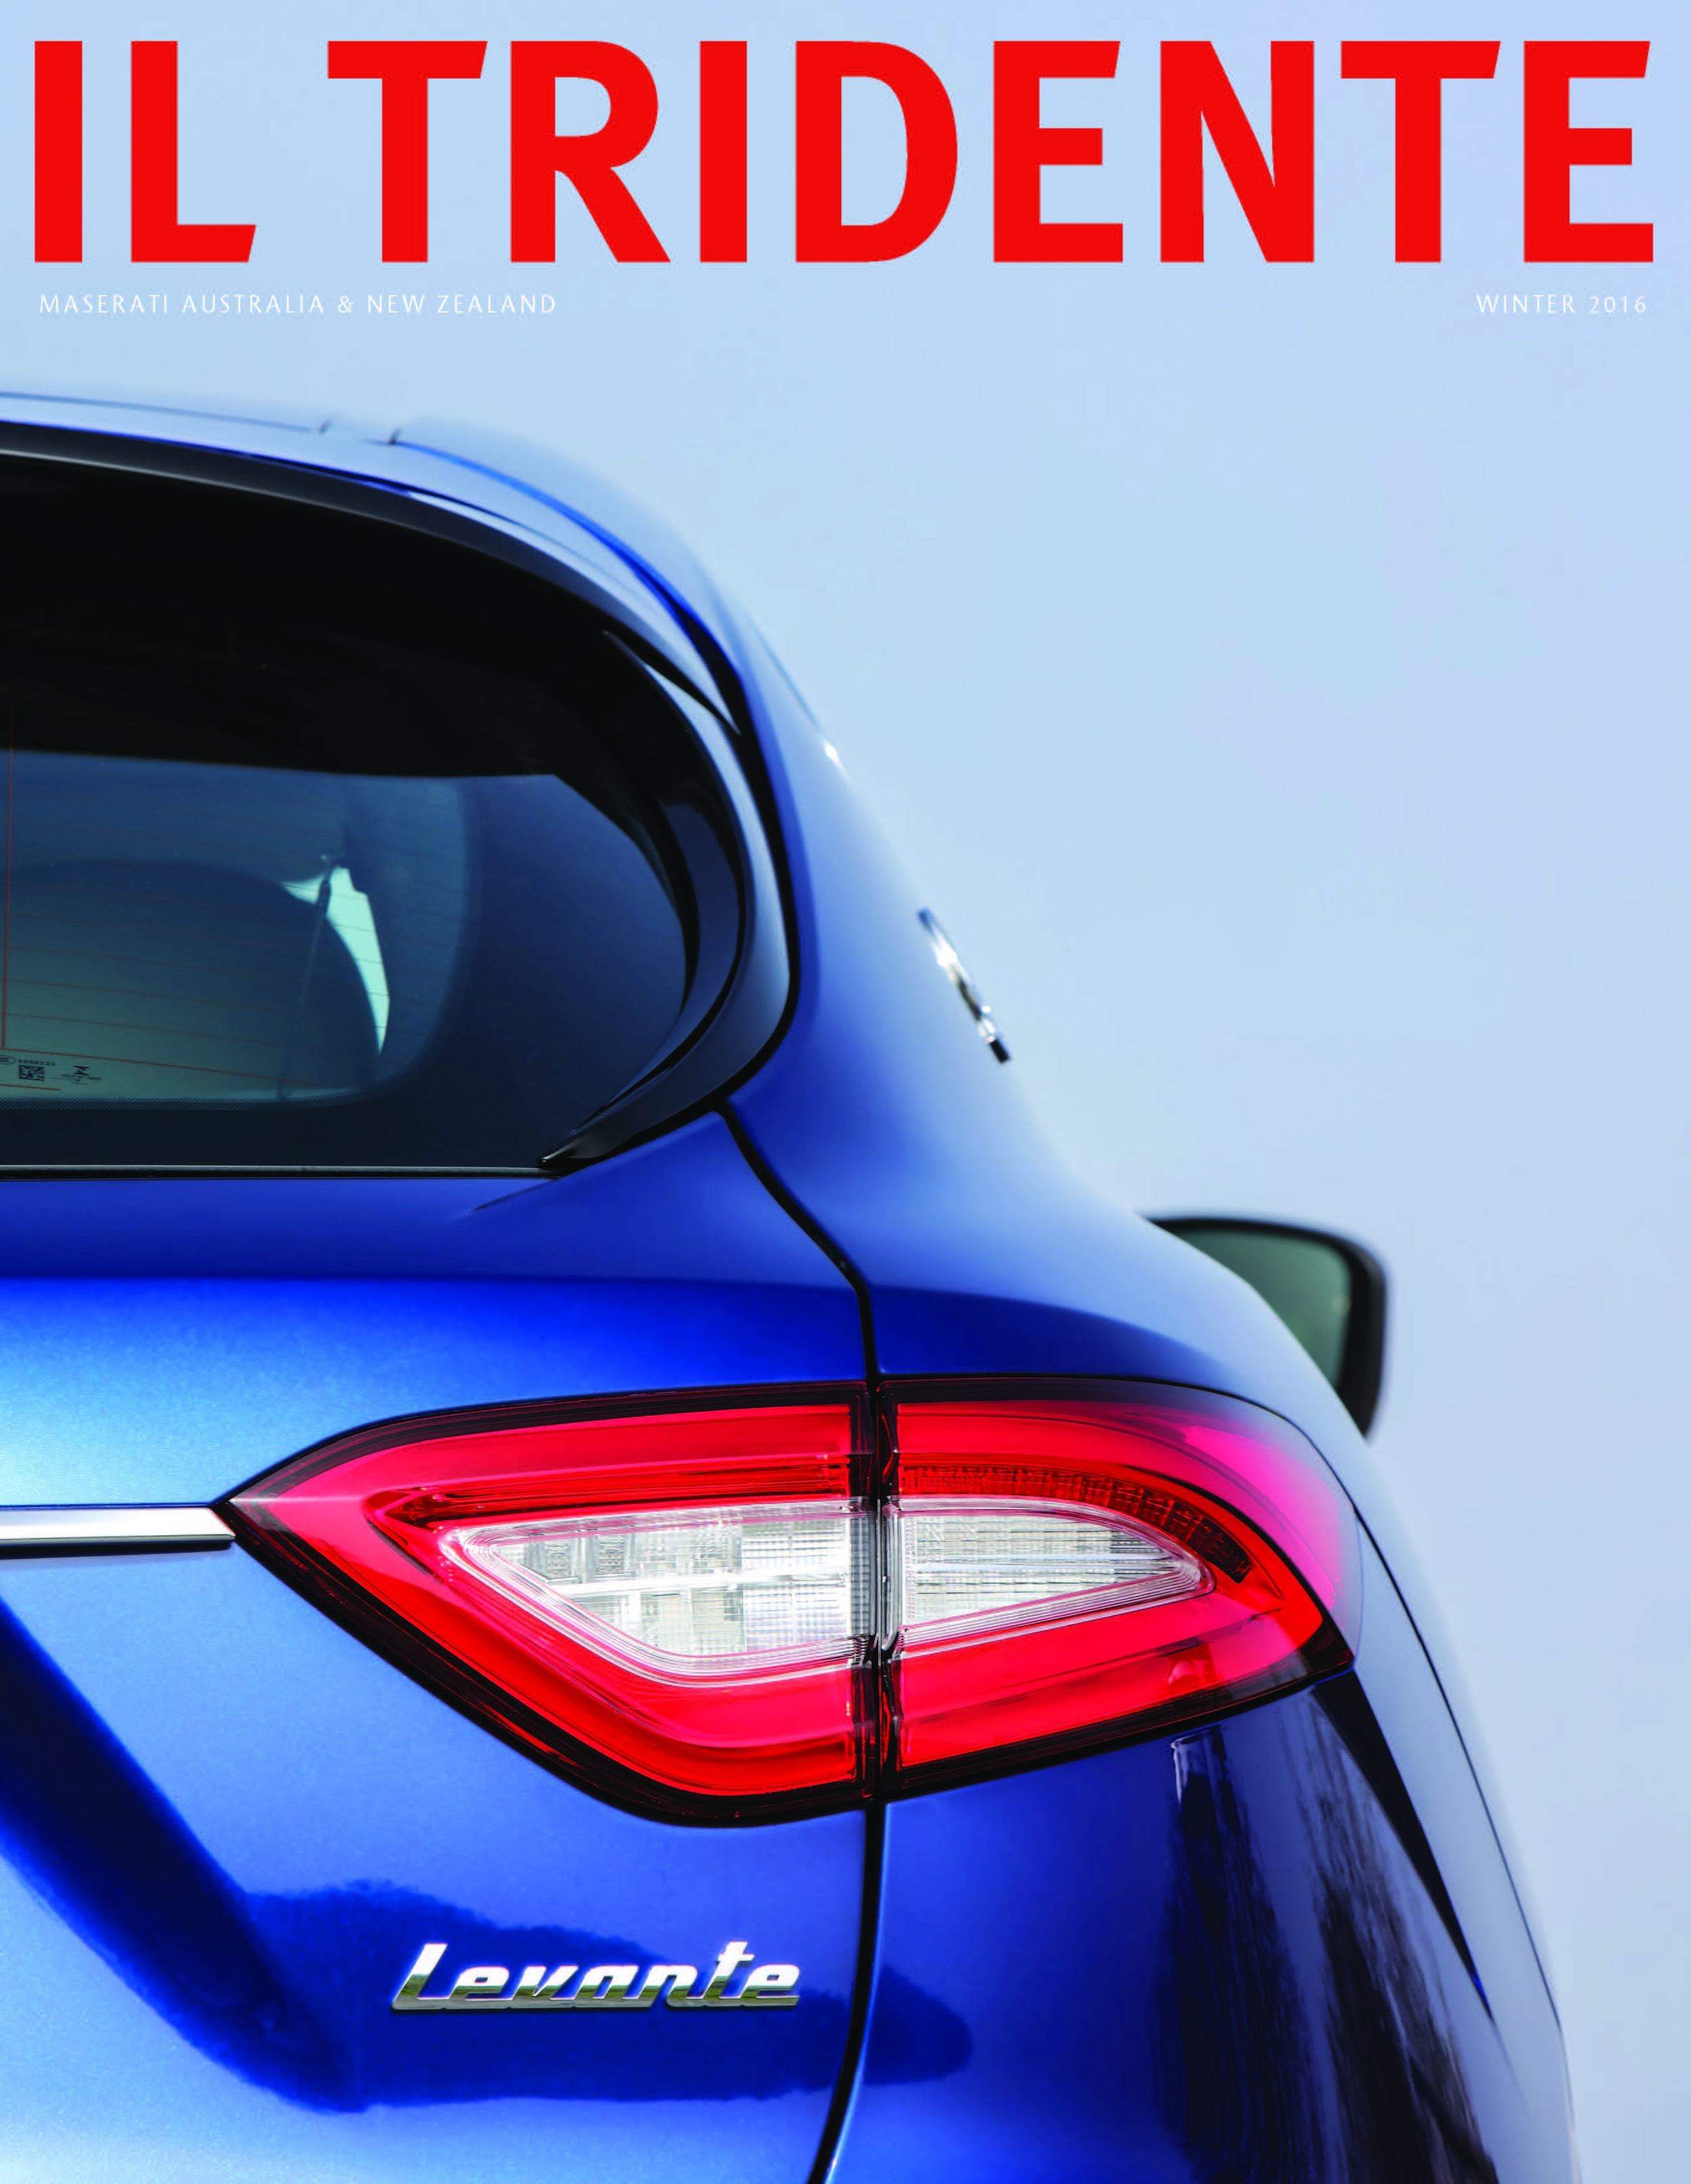 JULY 2016  | 'INSIDE LINE' - IL TREDENTE MAGAZINE